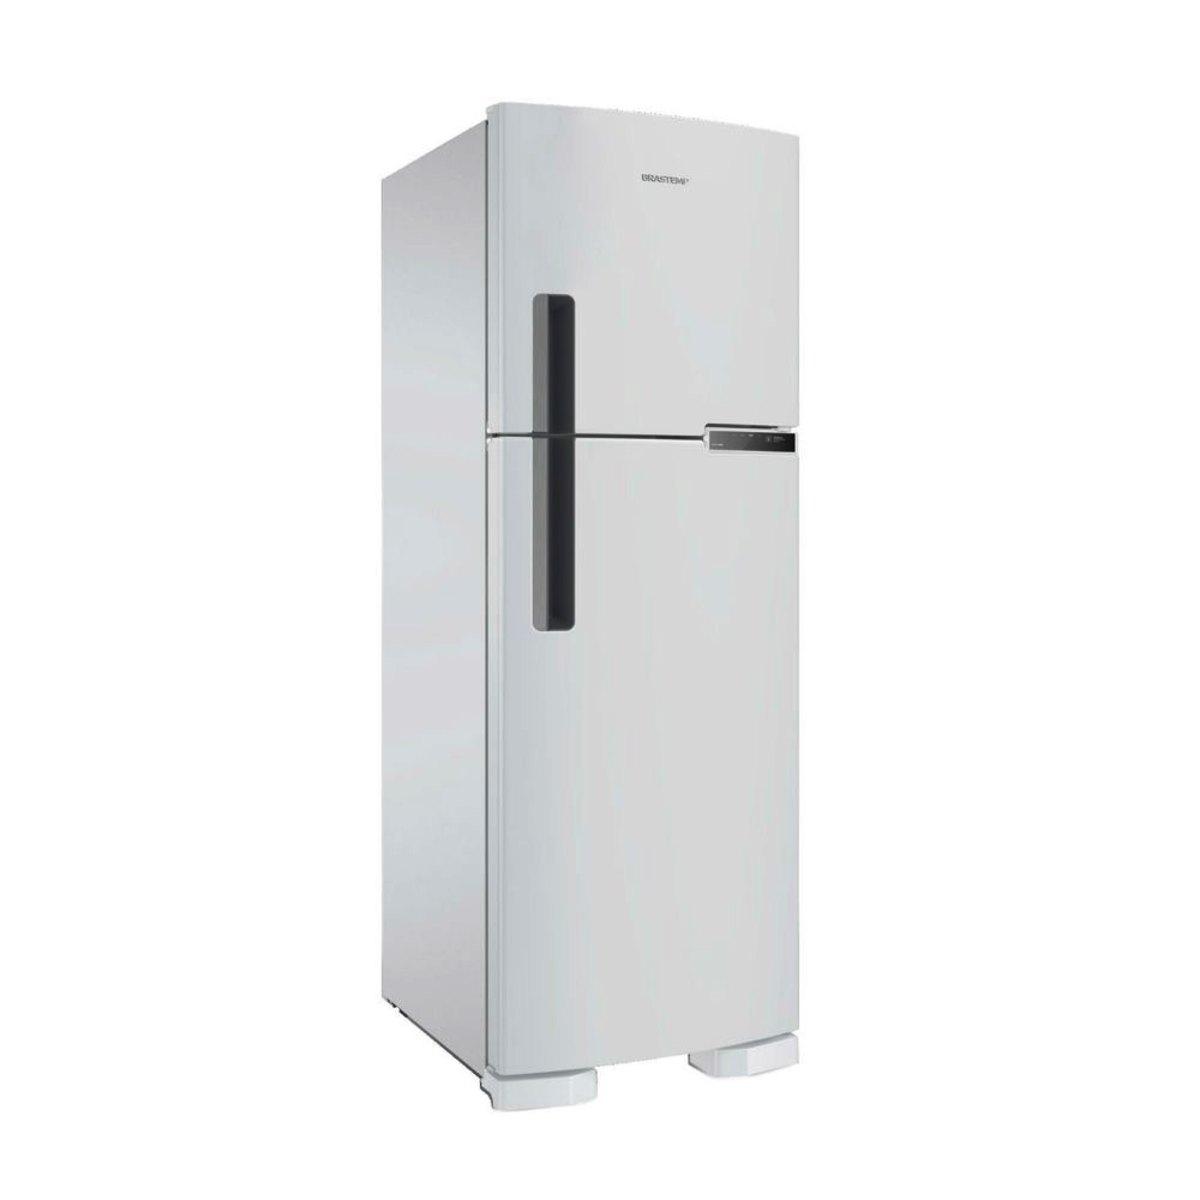 Geladeira Brastemp Frost Free Duplex 2 Portas BRM44HB 375 Litros Branco 110V